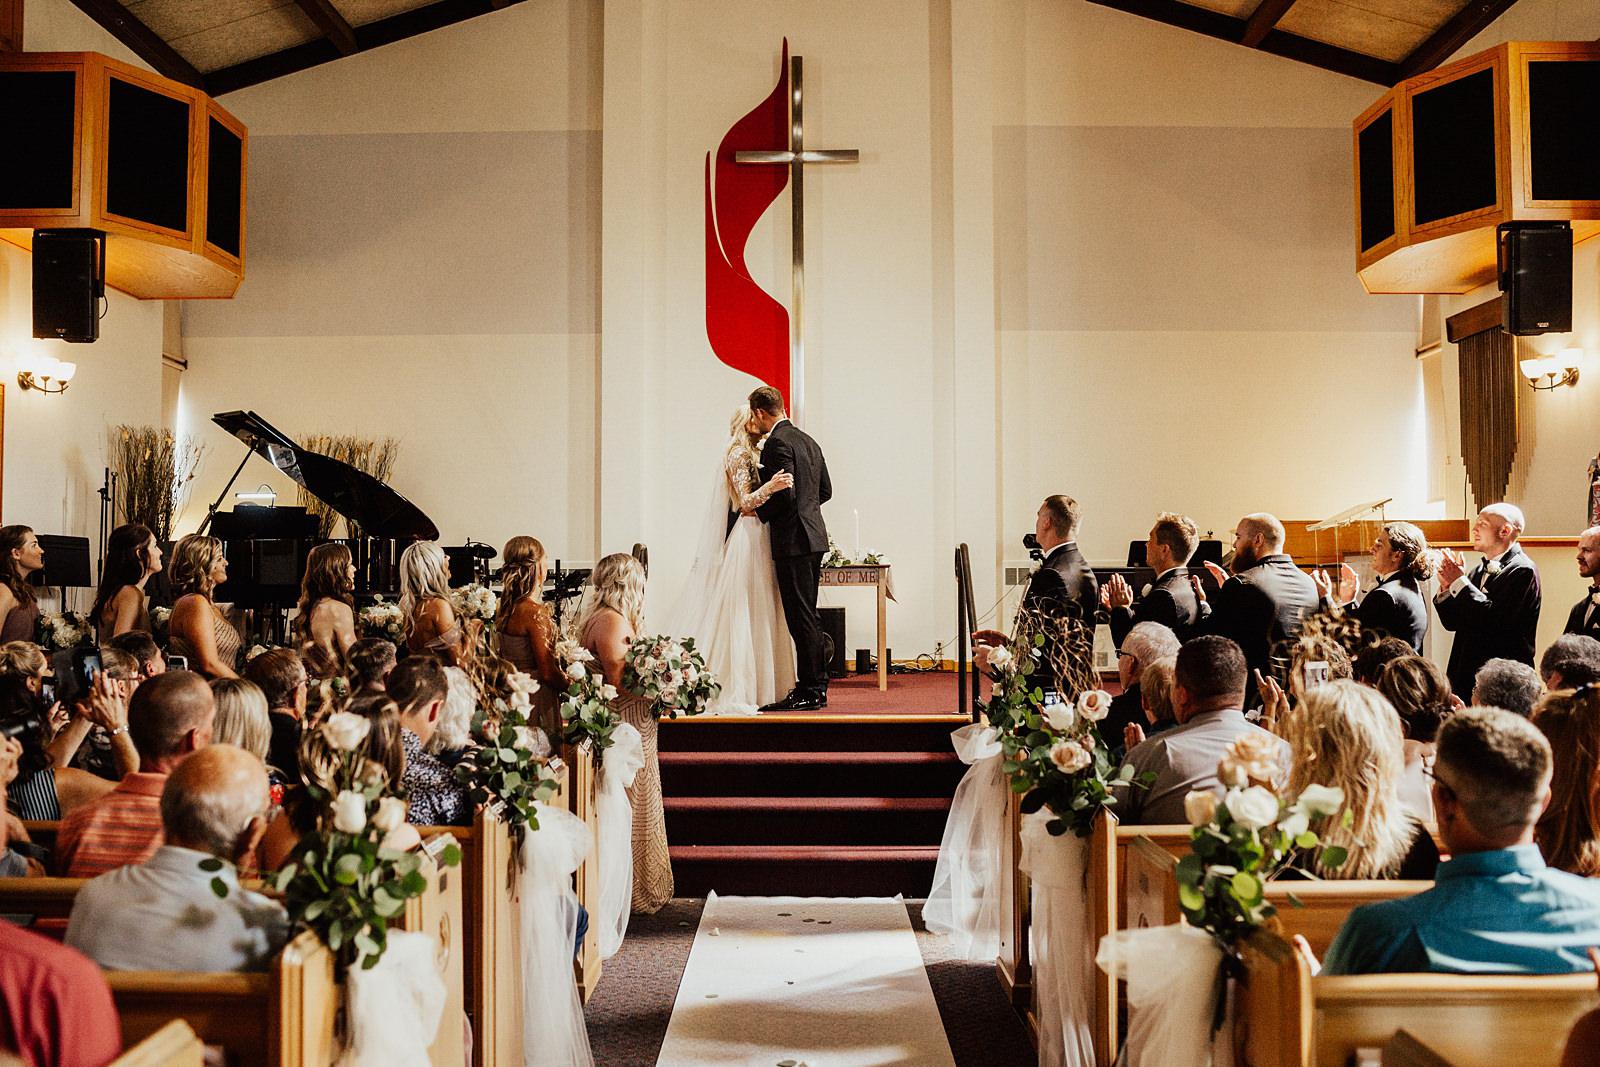 Molly & Bradley Modern Boho Wedding at The University Club Quad Cities-31.jpg